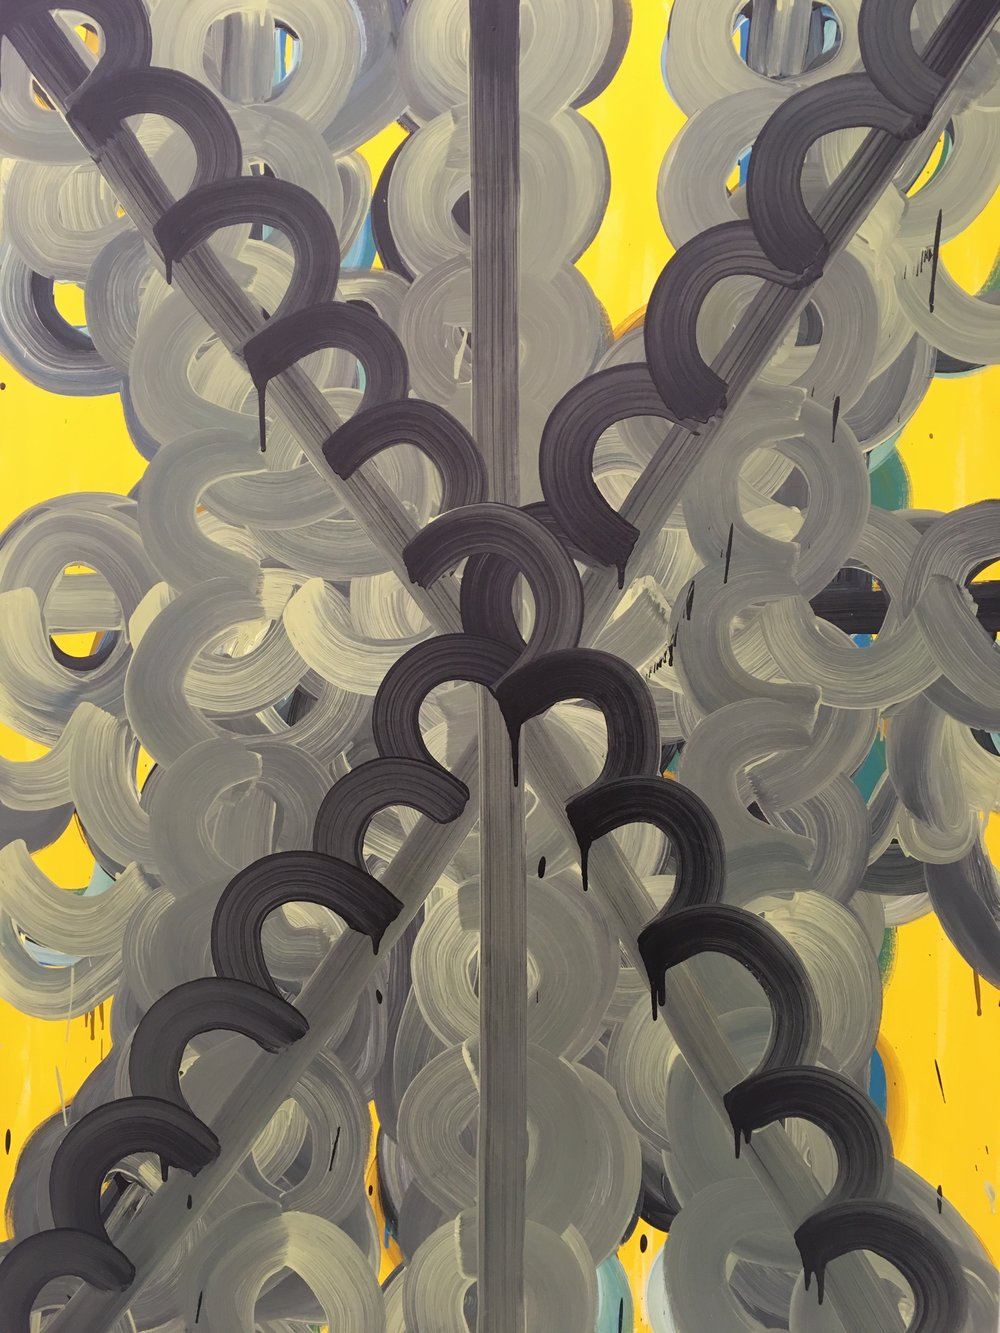 Elephant  2016,acrylic on canvas, 72 x 48 x 2 in (182.88 x 121.92 cm)